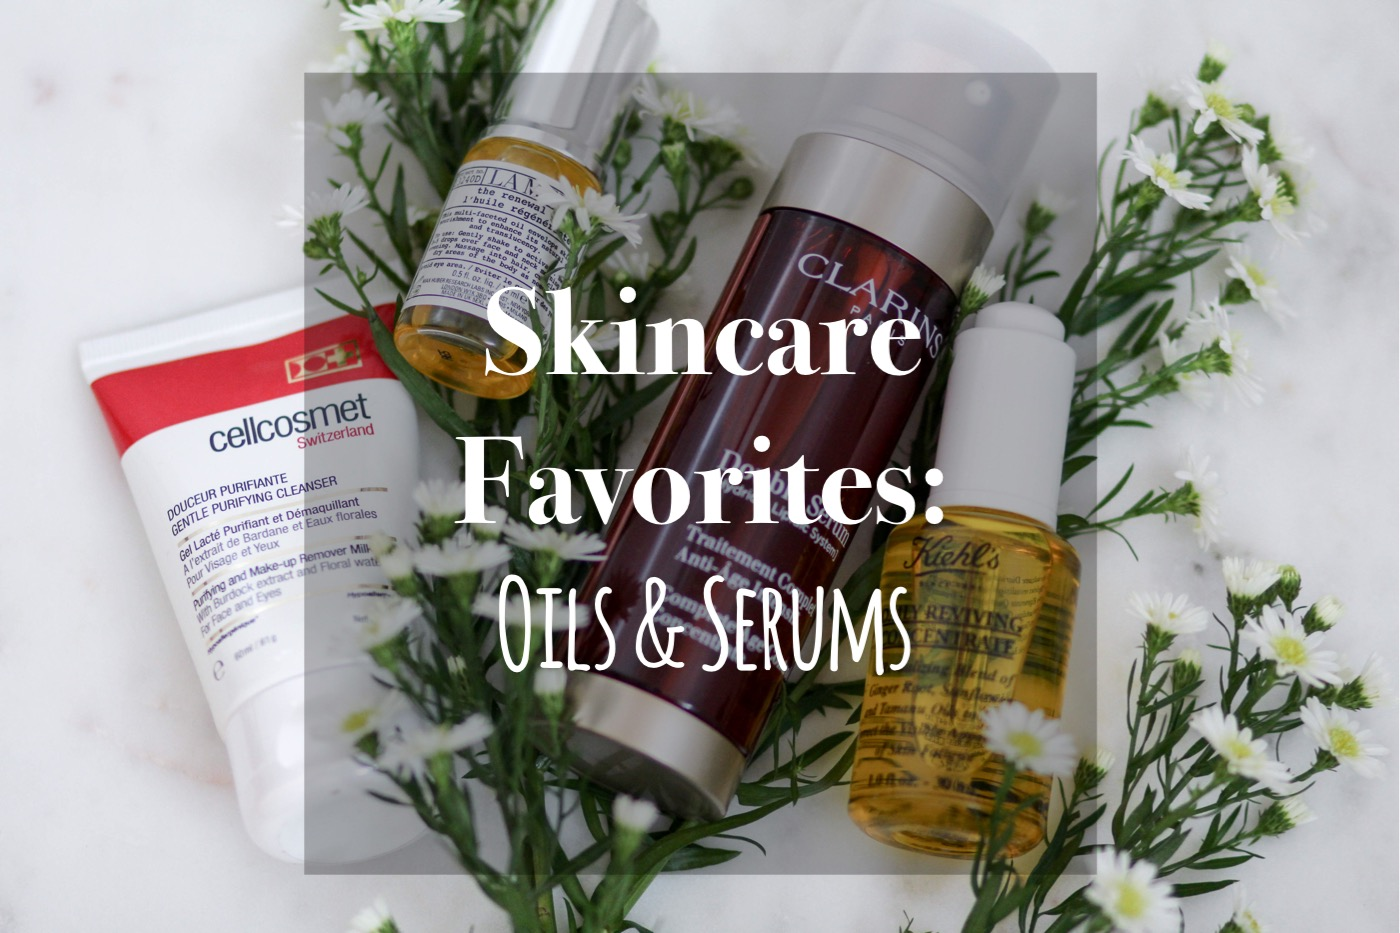 My Current Skincare Favorites: Oils & Serums